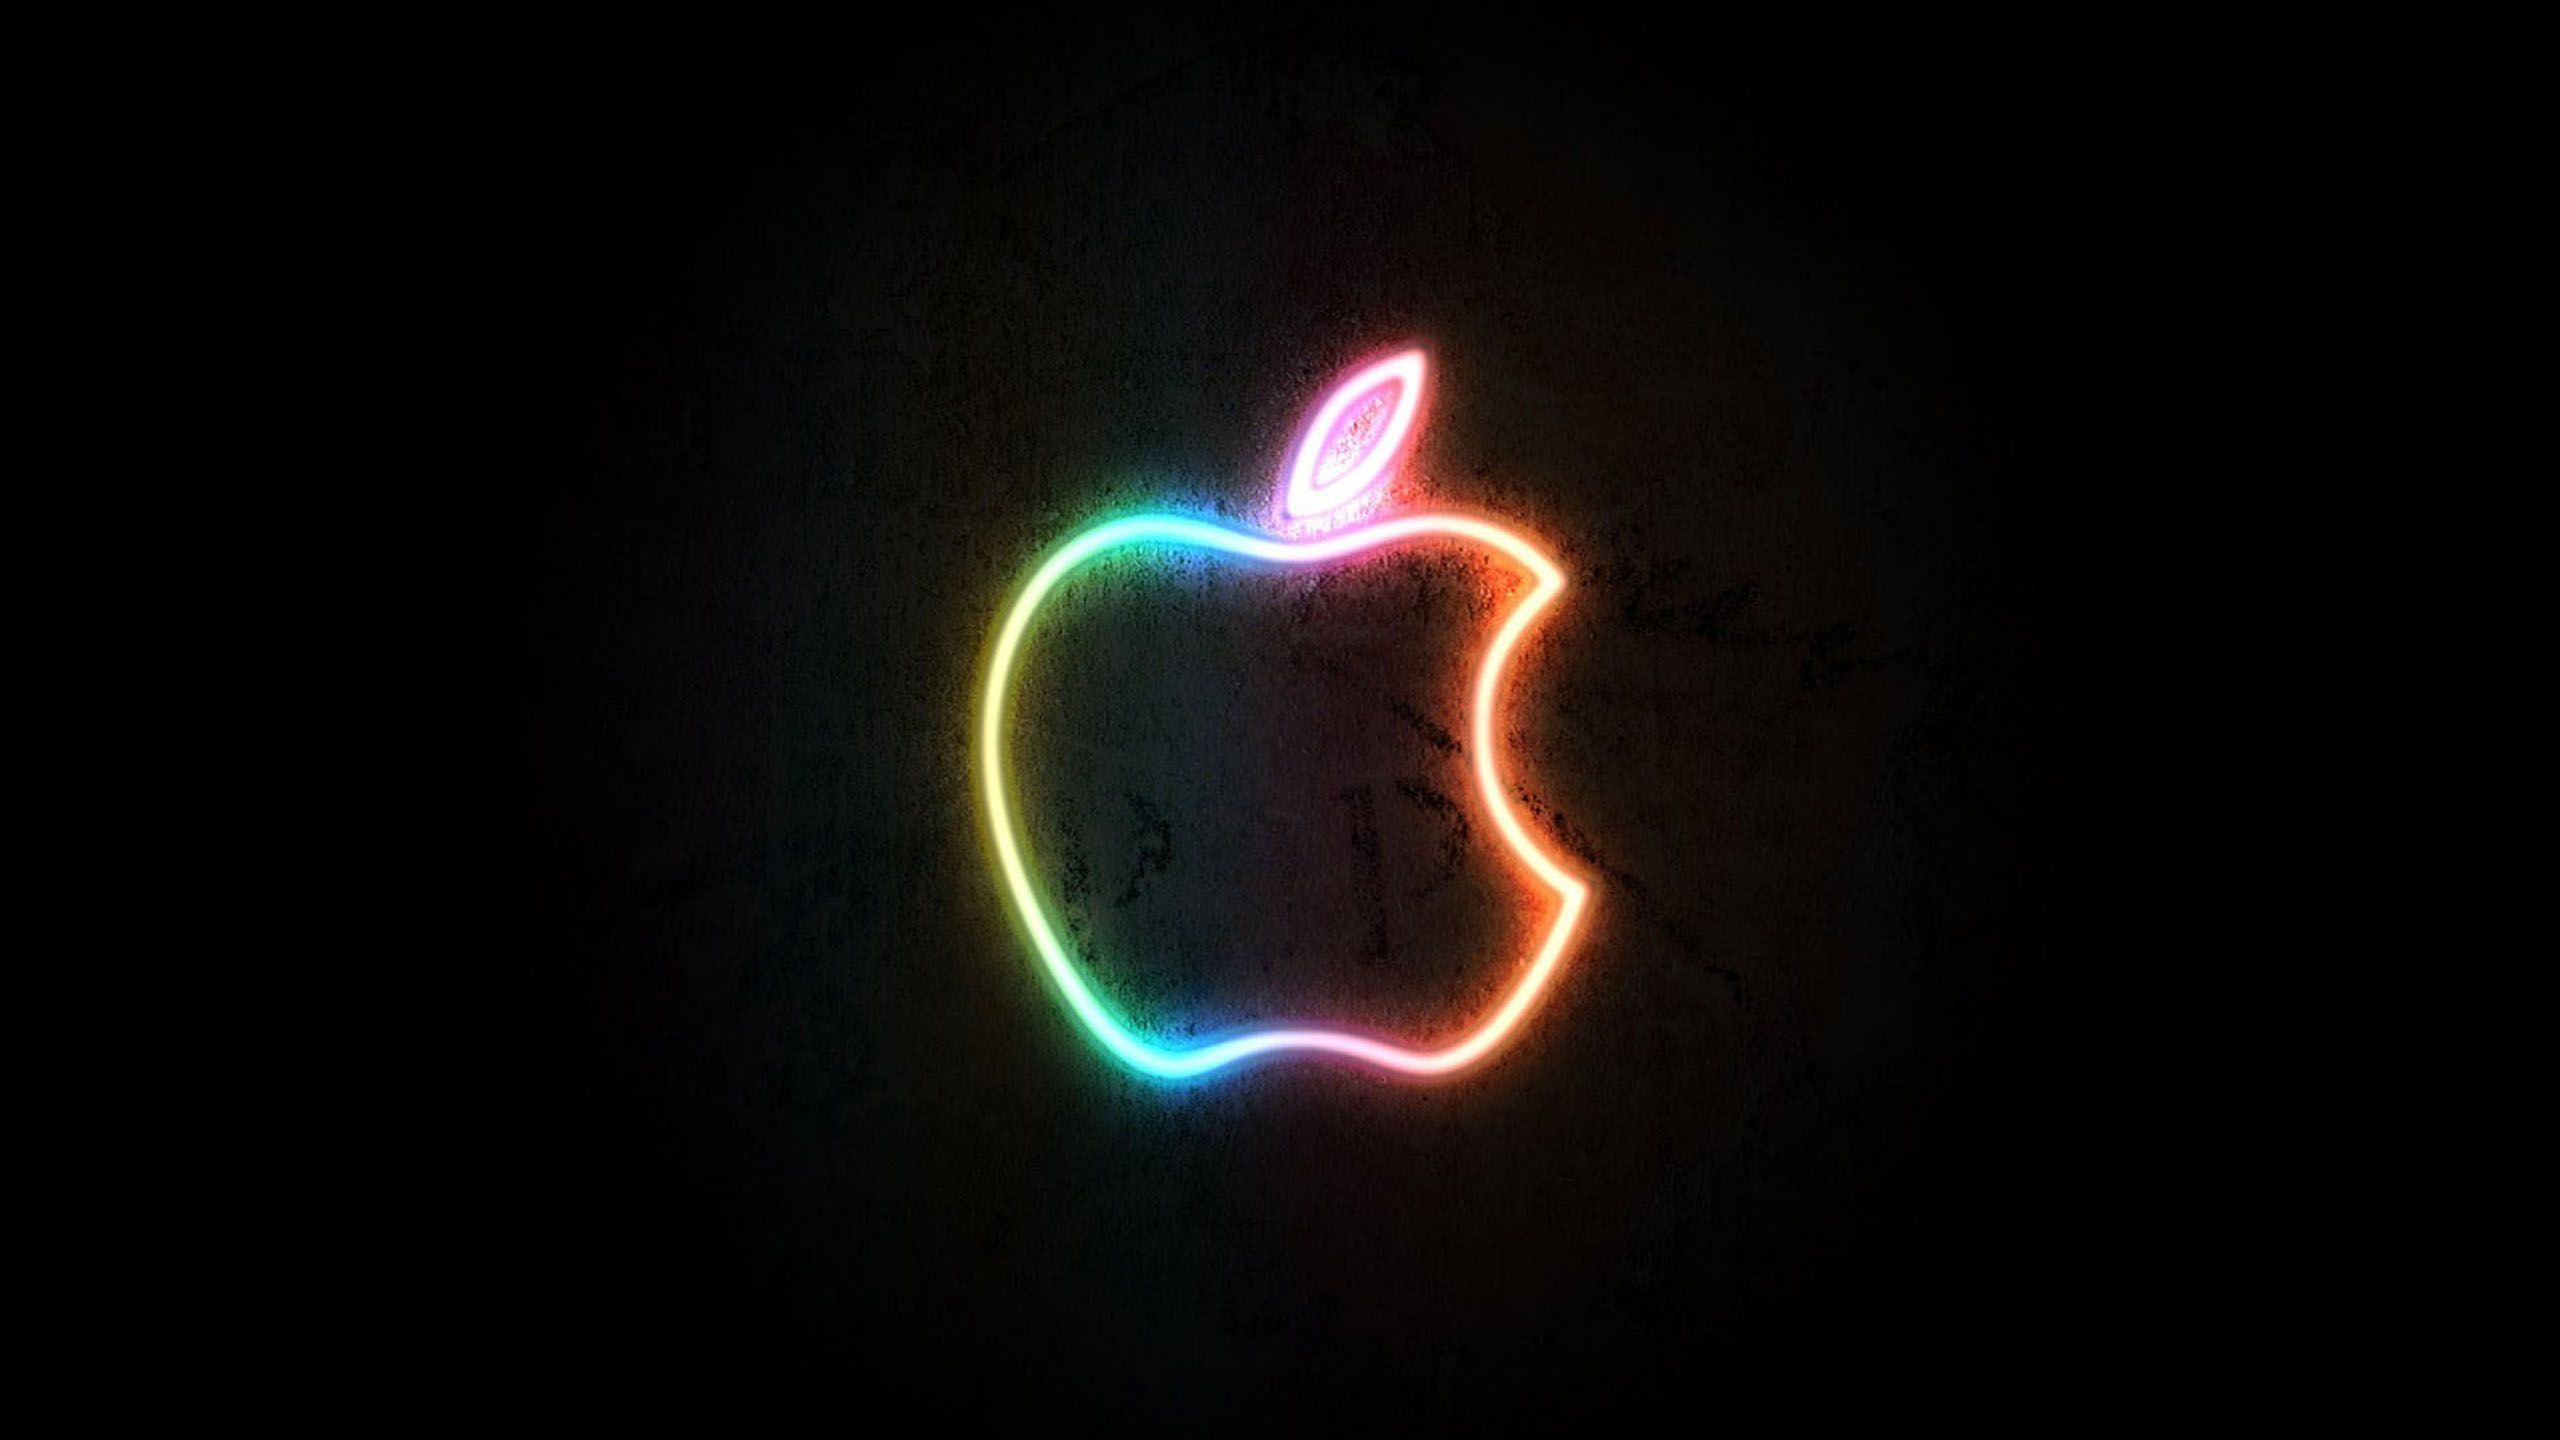 Revelion Cu Apple Desktop Wallpapers Apple Picture Logo Wallpaper Hd Wallpaper Iphone Neon